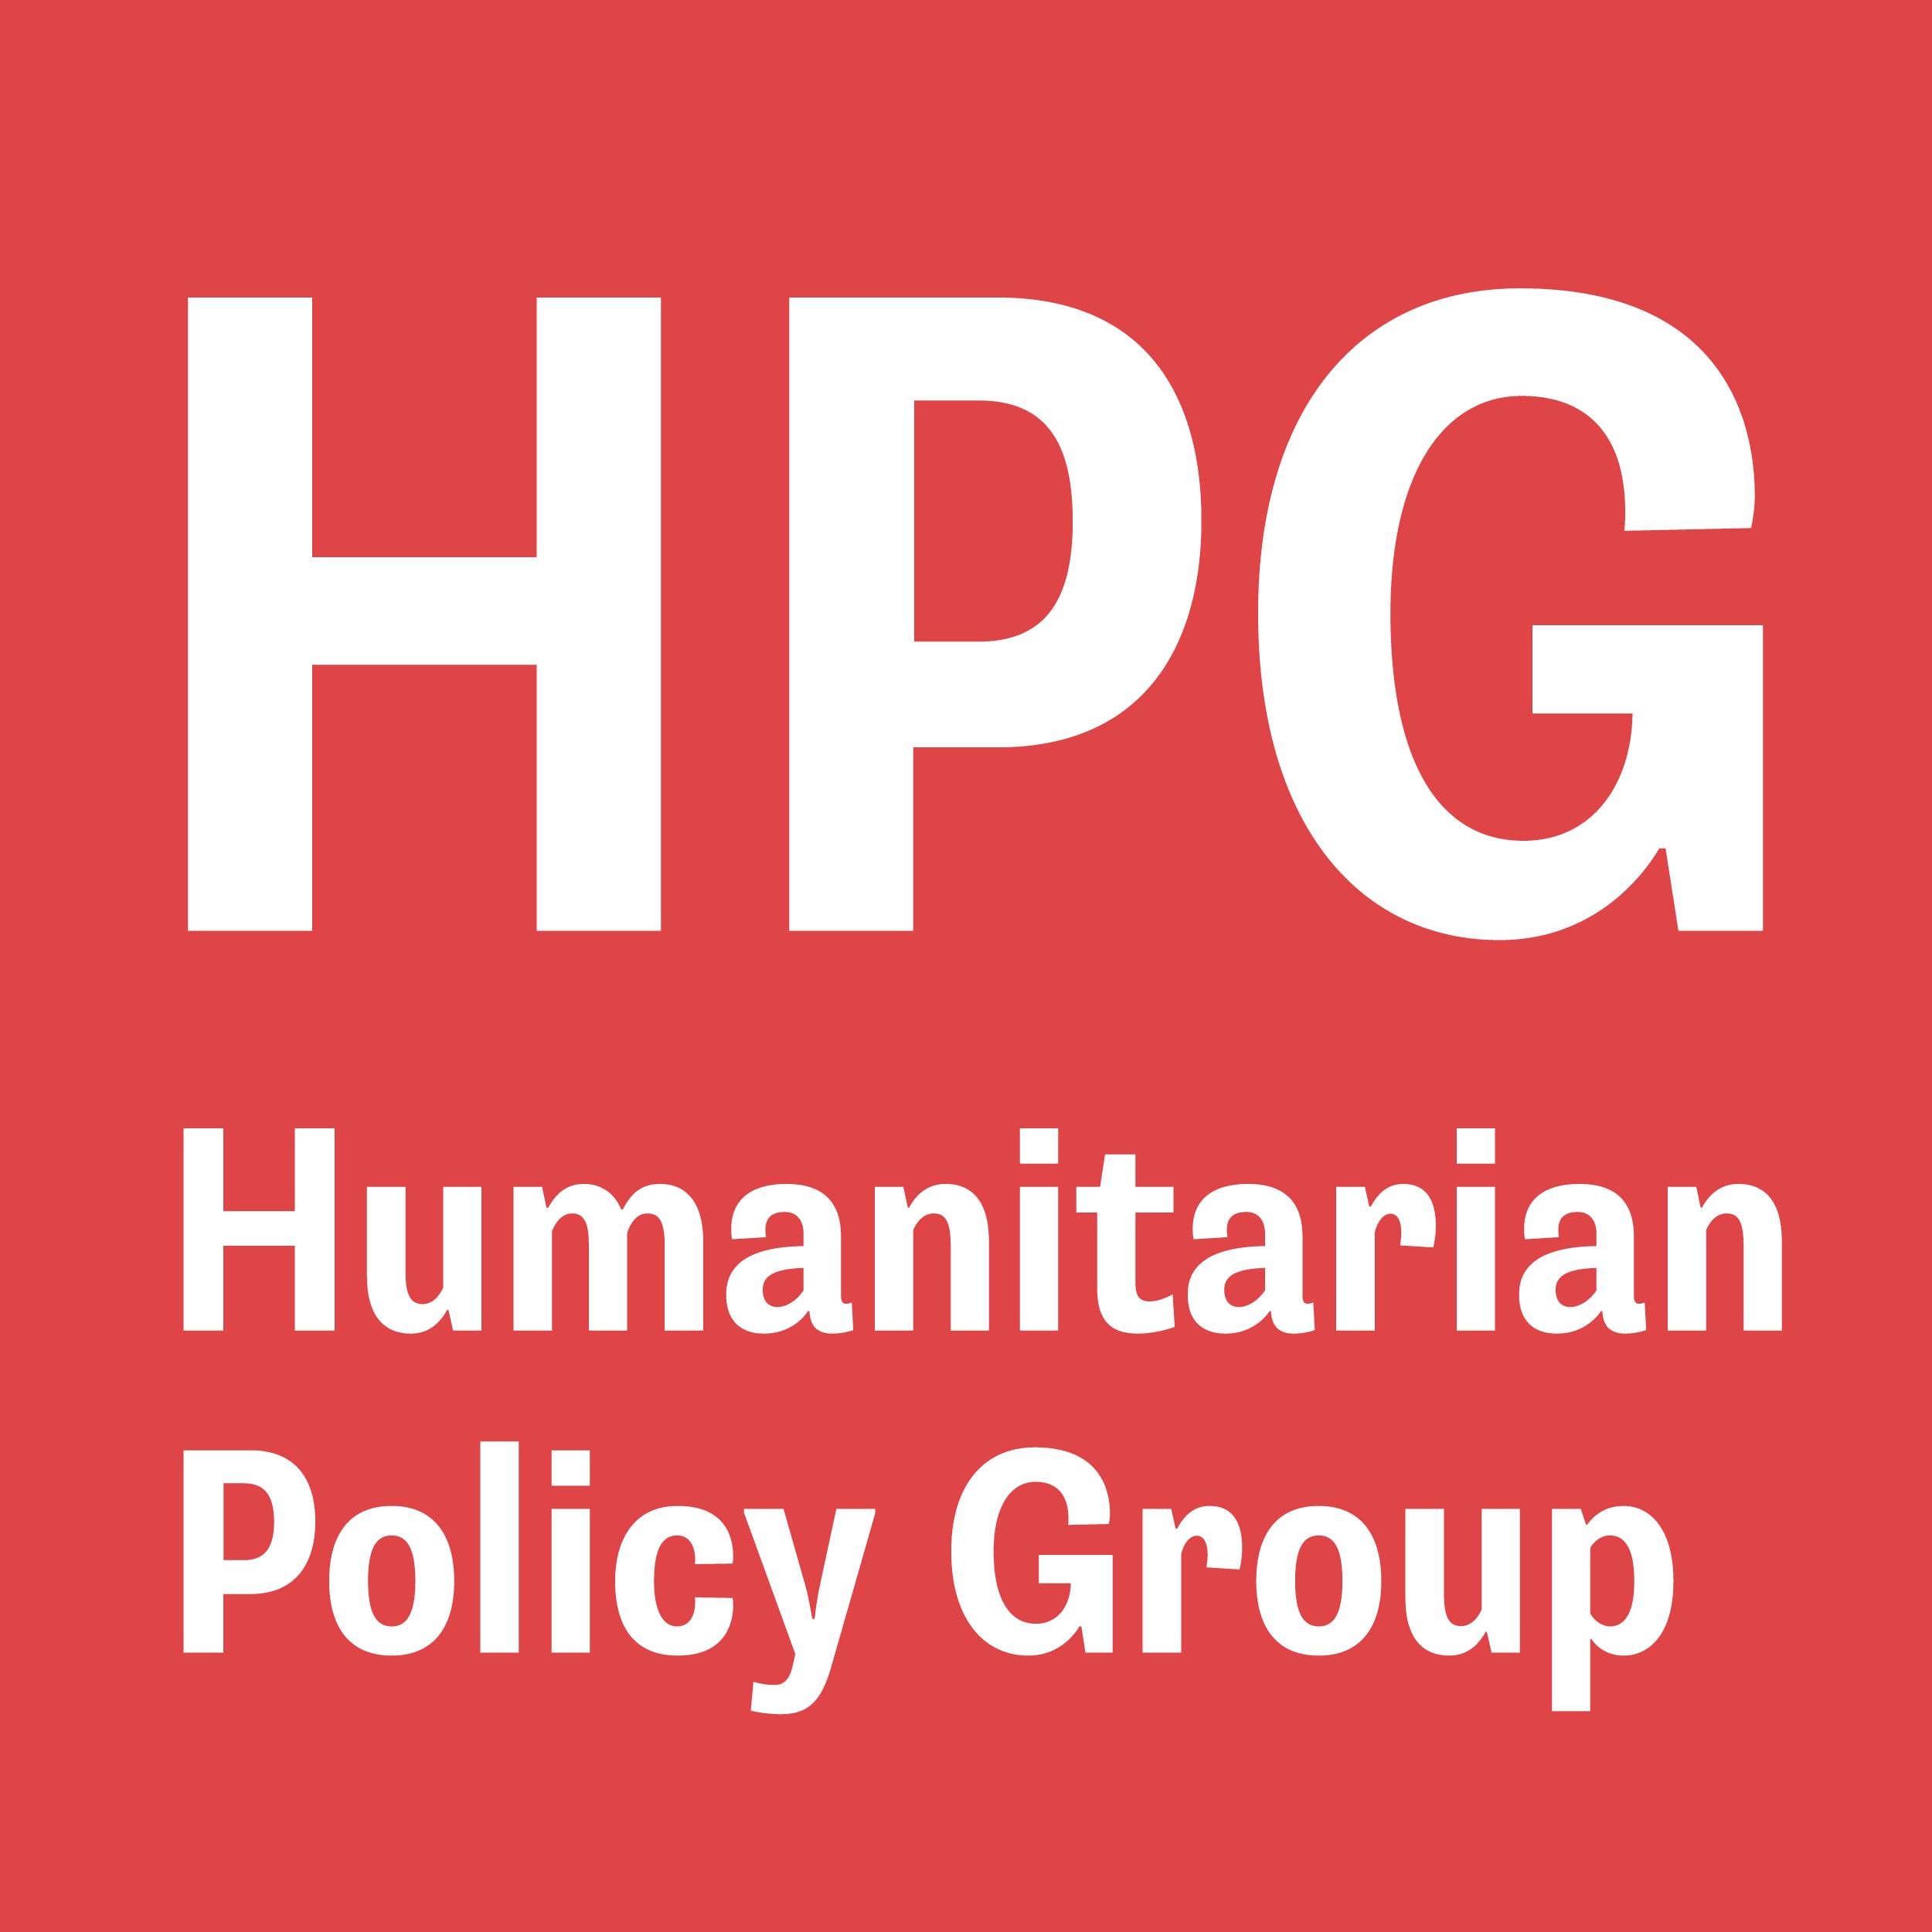 hpg_logo_002.jpg